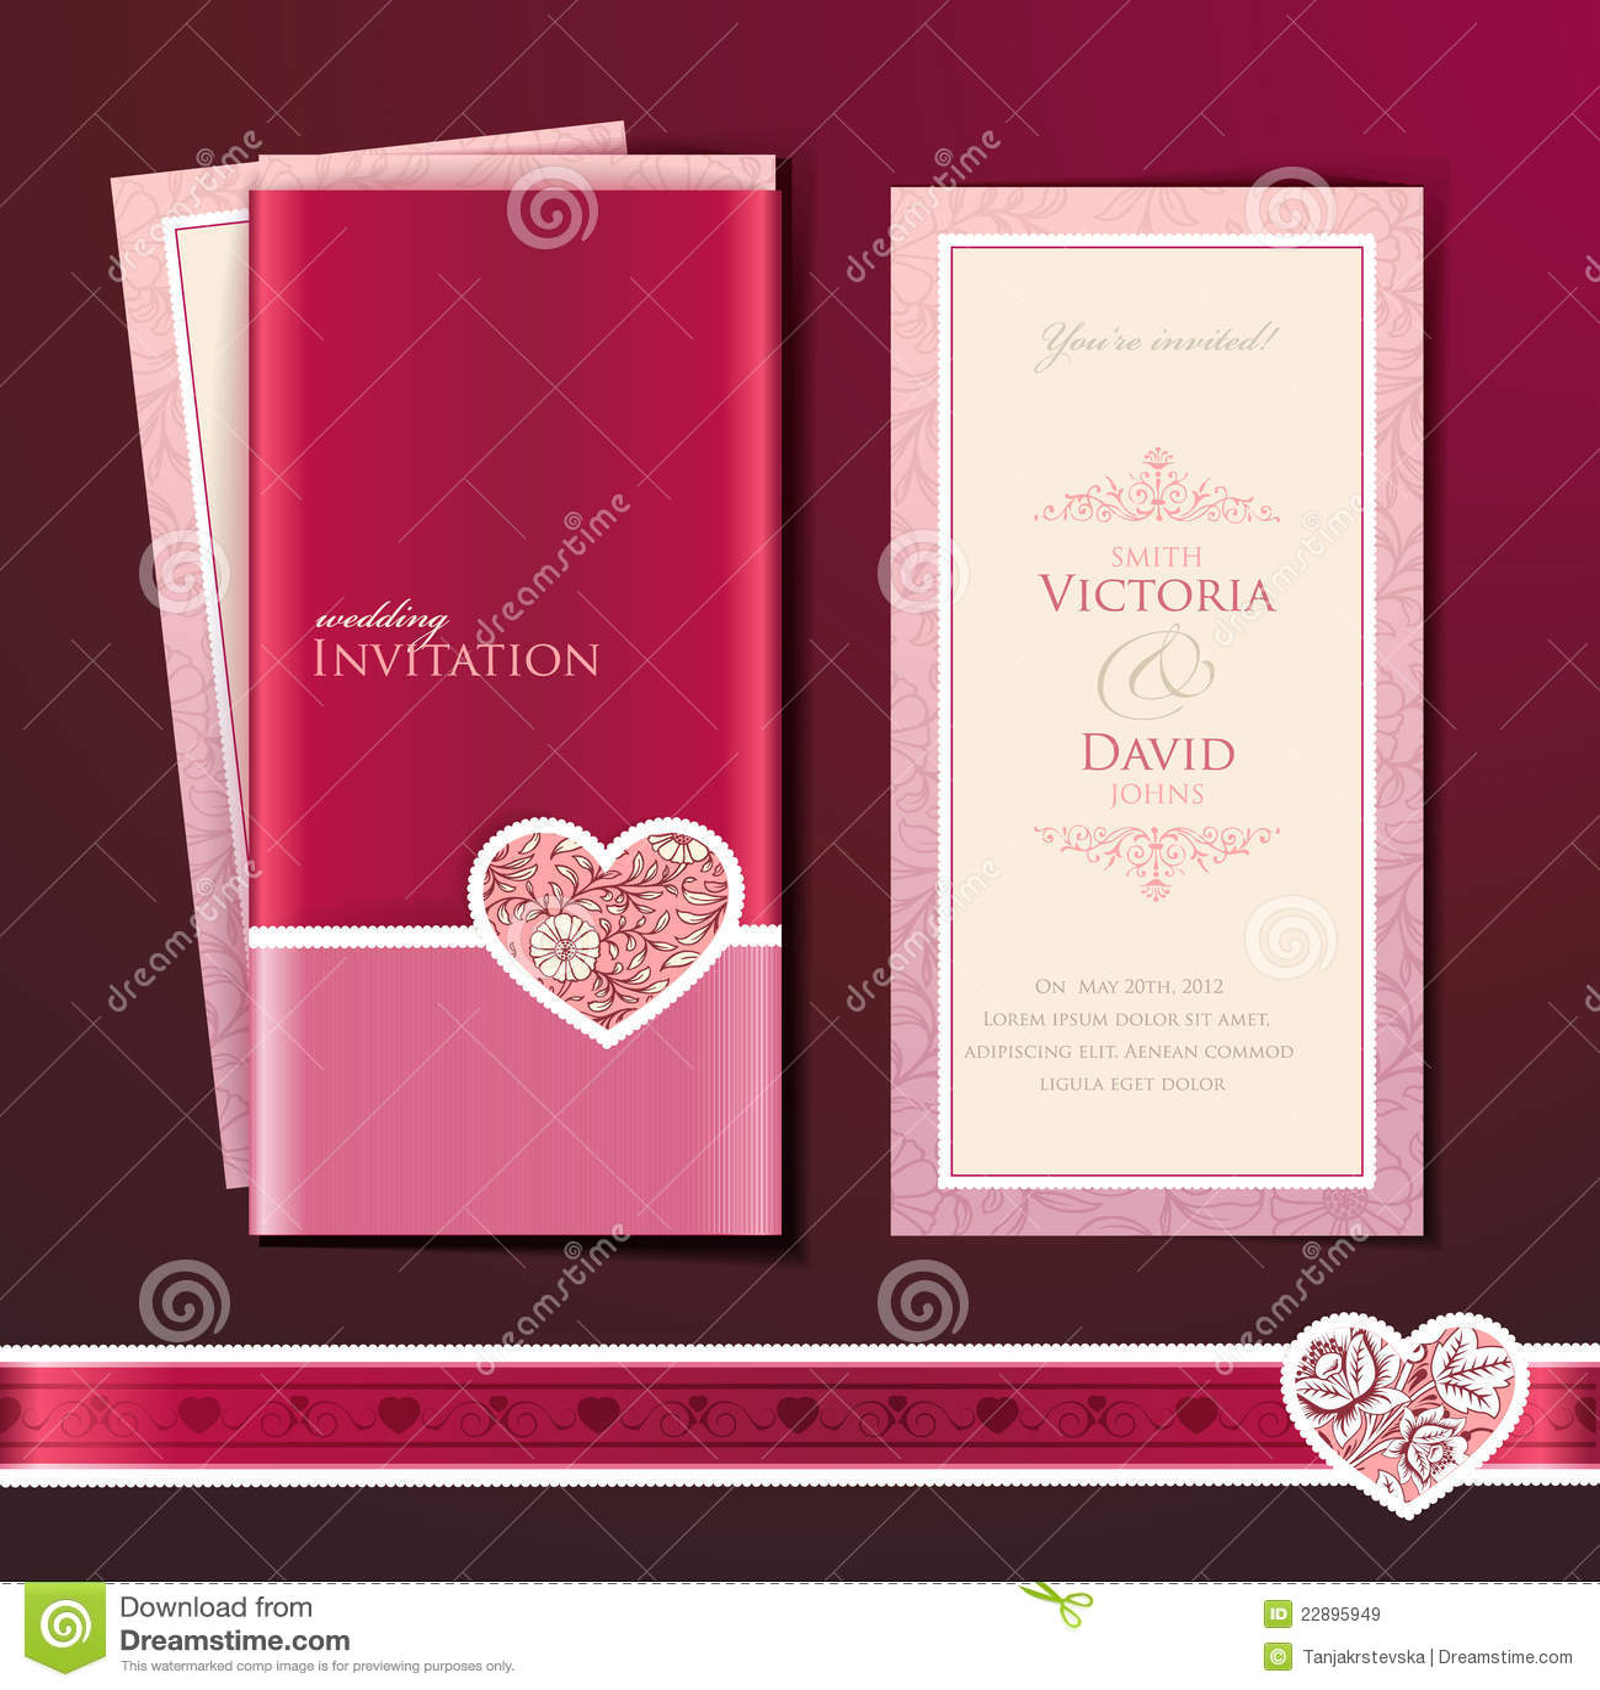 Wedding invitation card stock vector. Illustration of male - 22895949